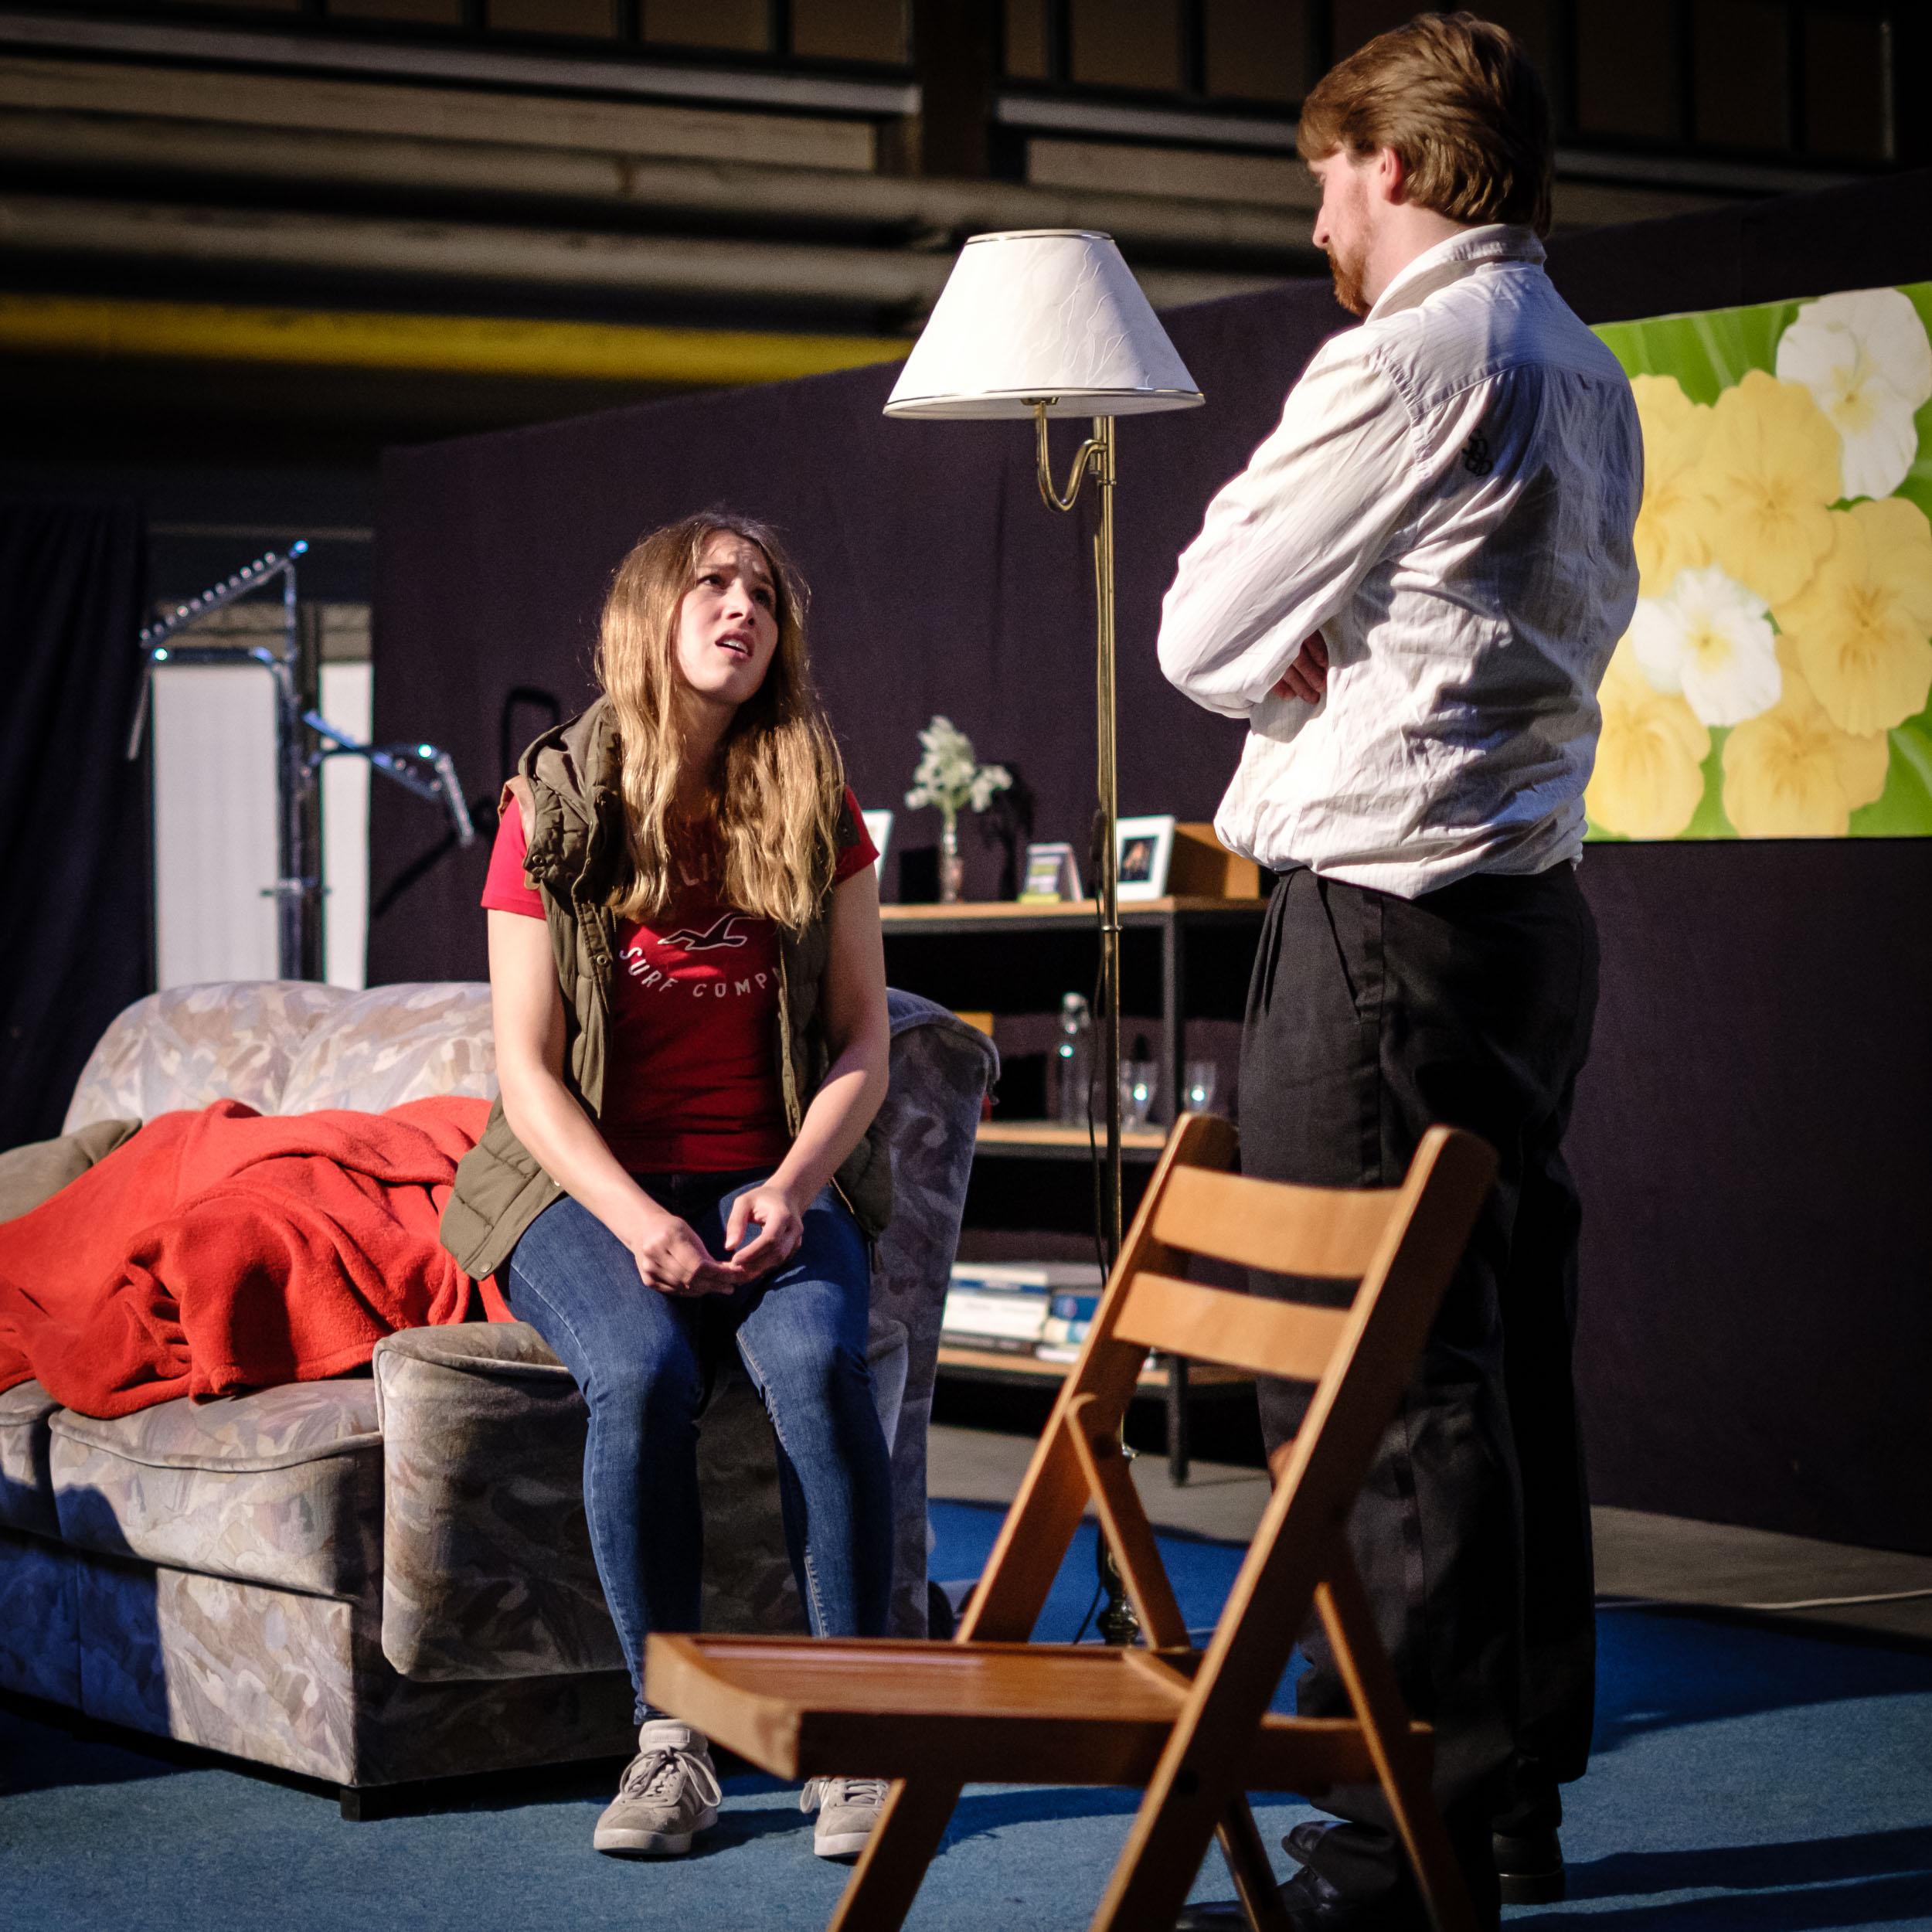 Nele Heuser, Patrick Dietrich, Buhnentheater Vlotho